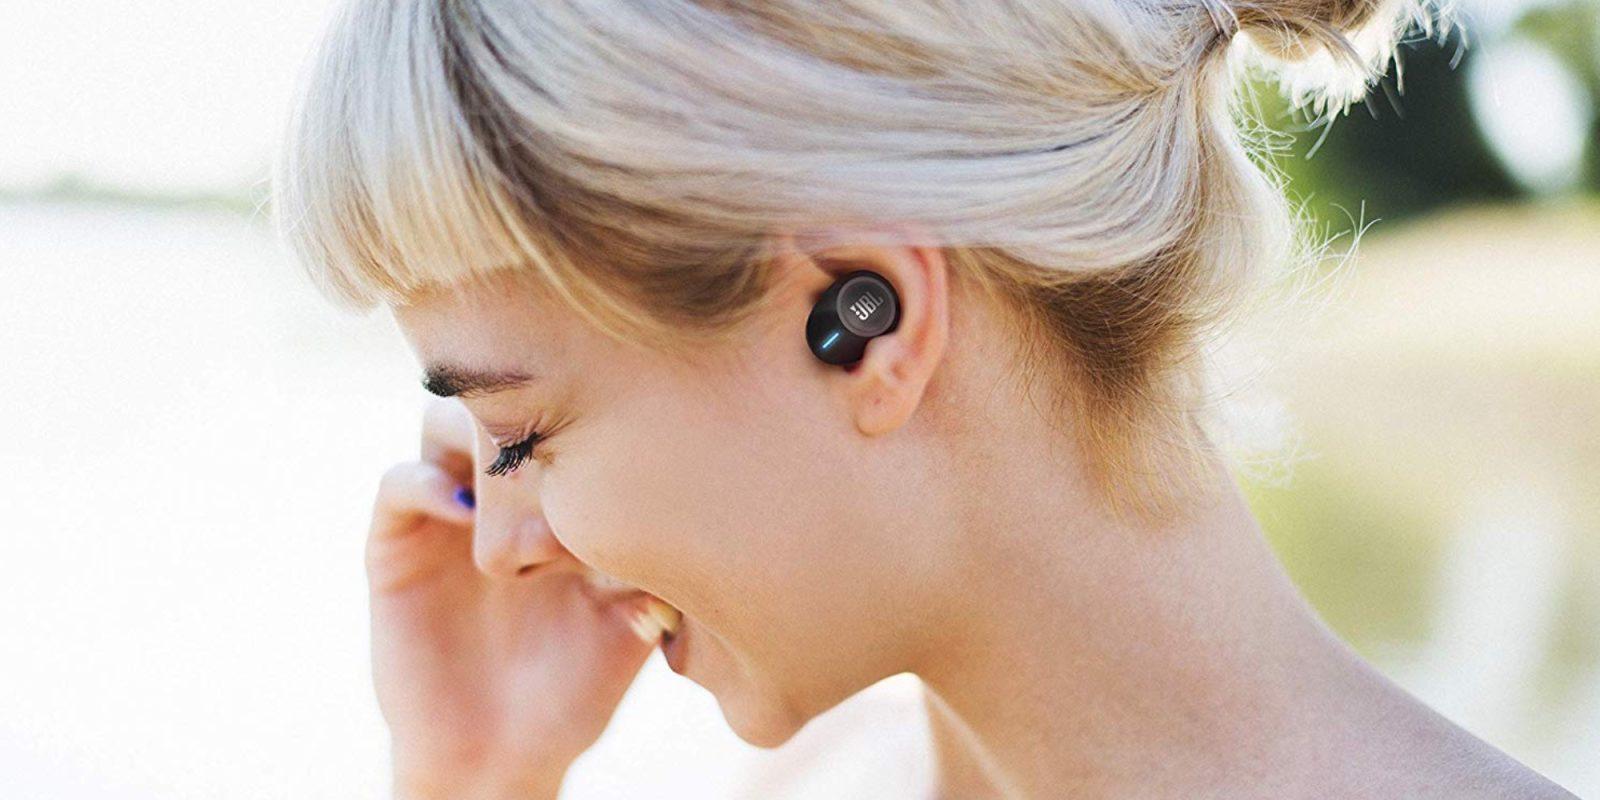 Smartphone Accessories: JBL Tune True Wireless Earbuds $70 (Save $30), more